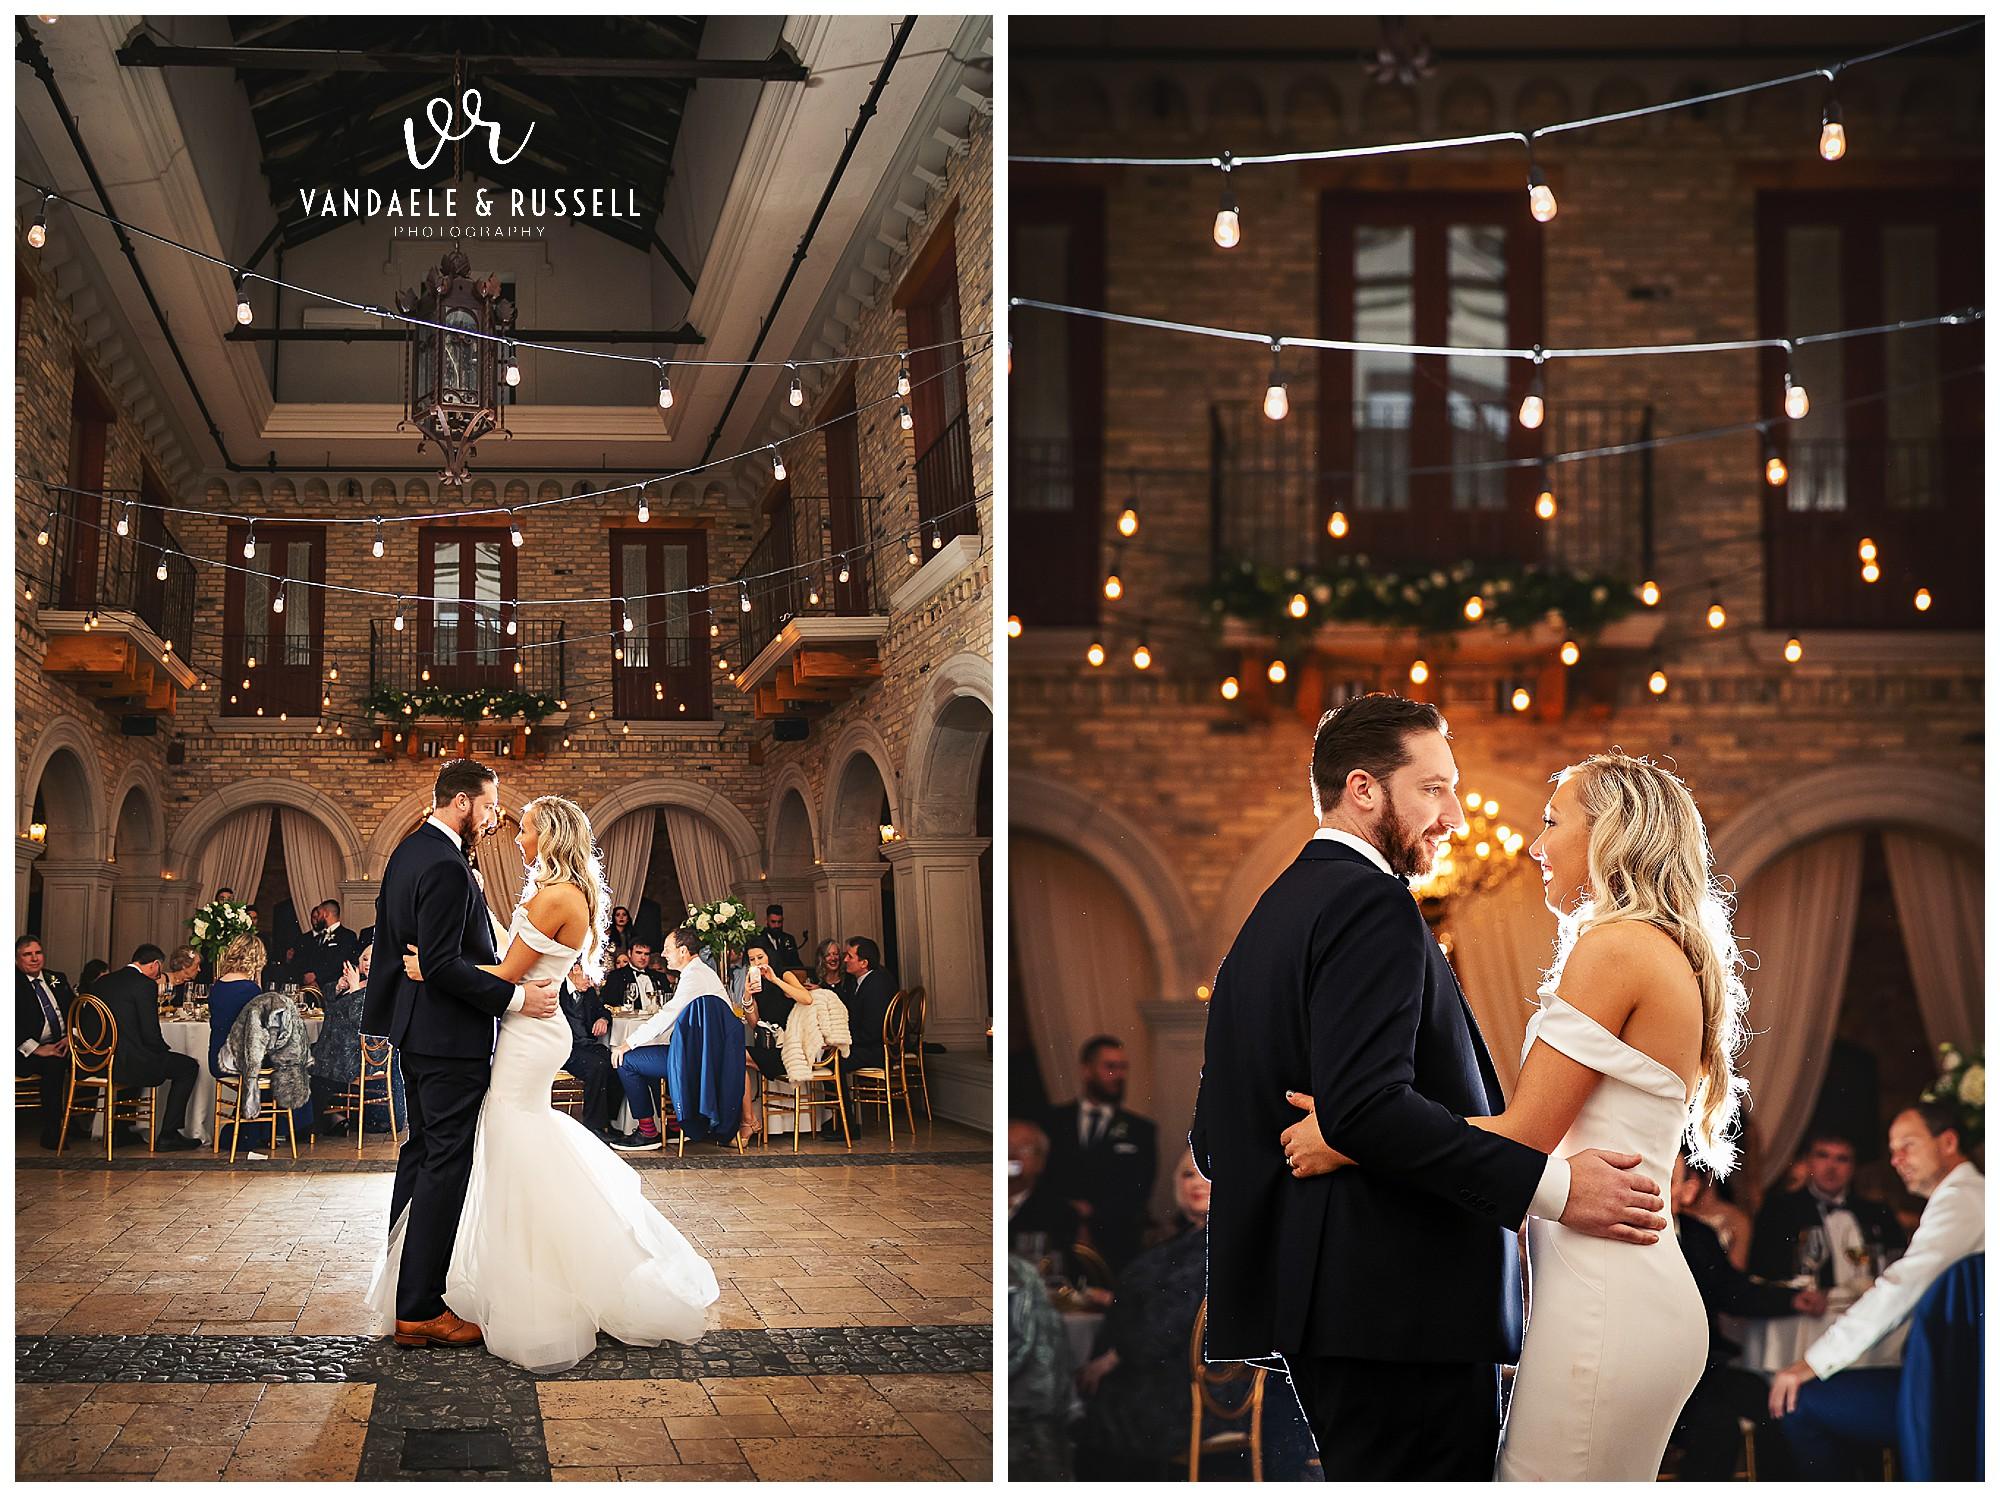 Hacienda-Sarria-Wedding-Photos-NYE-Michelle-Matt-VanDaele-Russell_0040.jpg